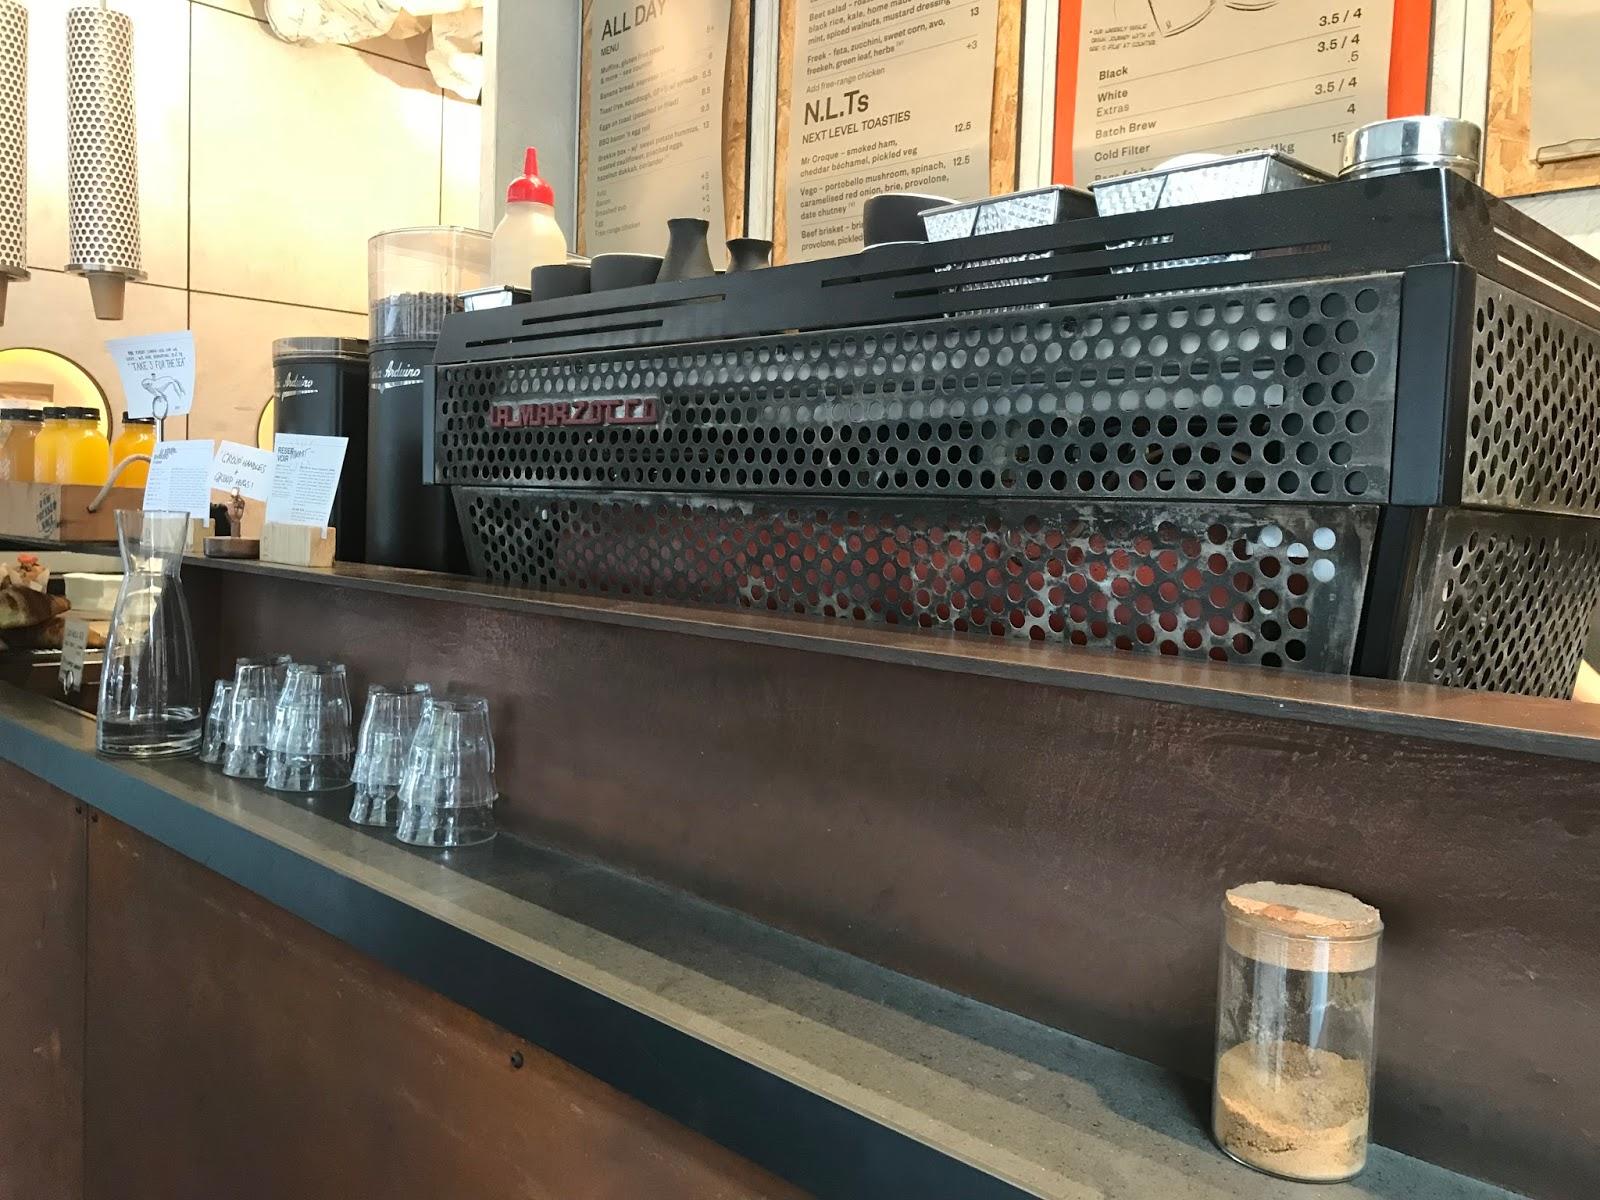 Double Skinny Macchiato: 16 Great Speciality Coffee Spots in Sydney